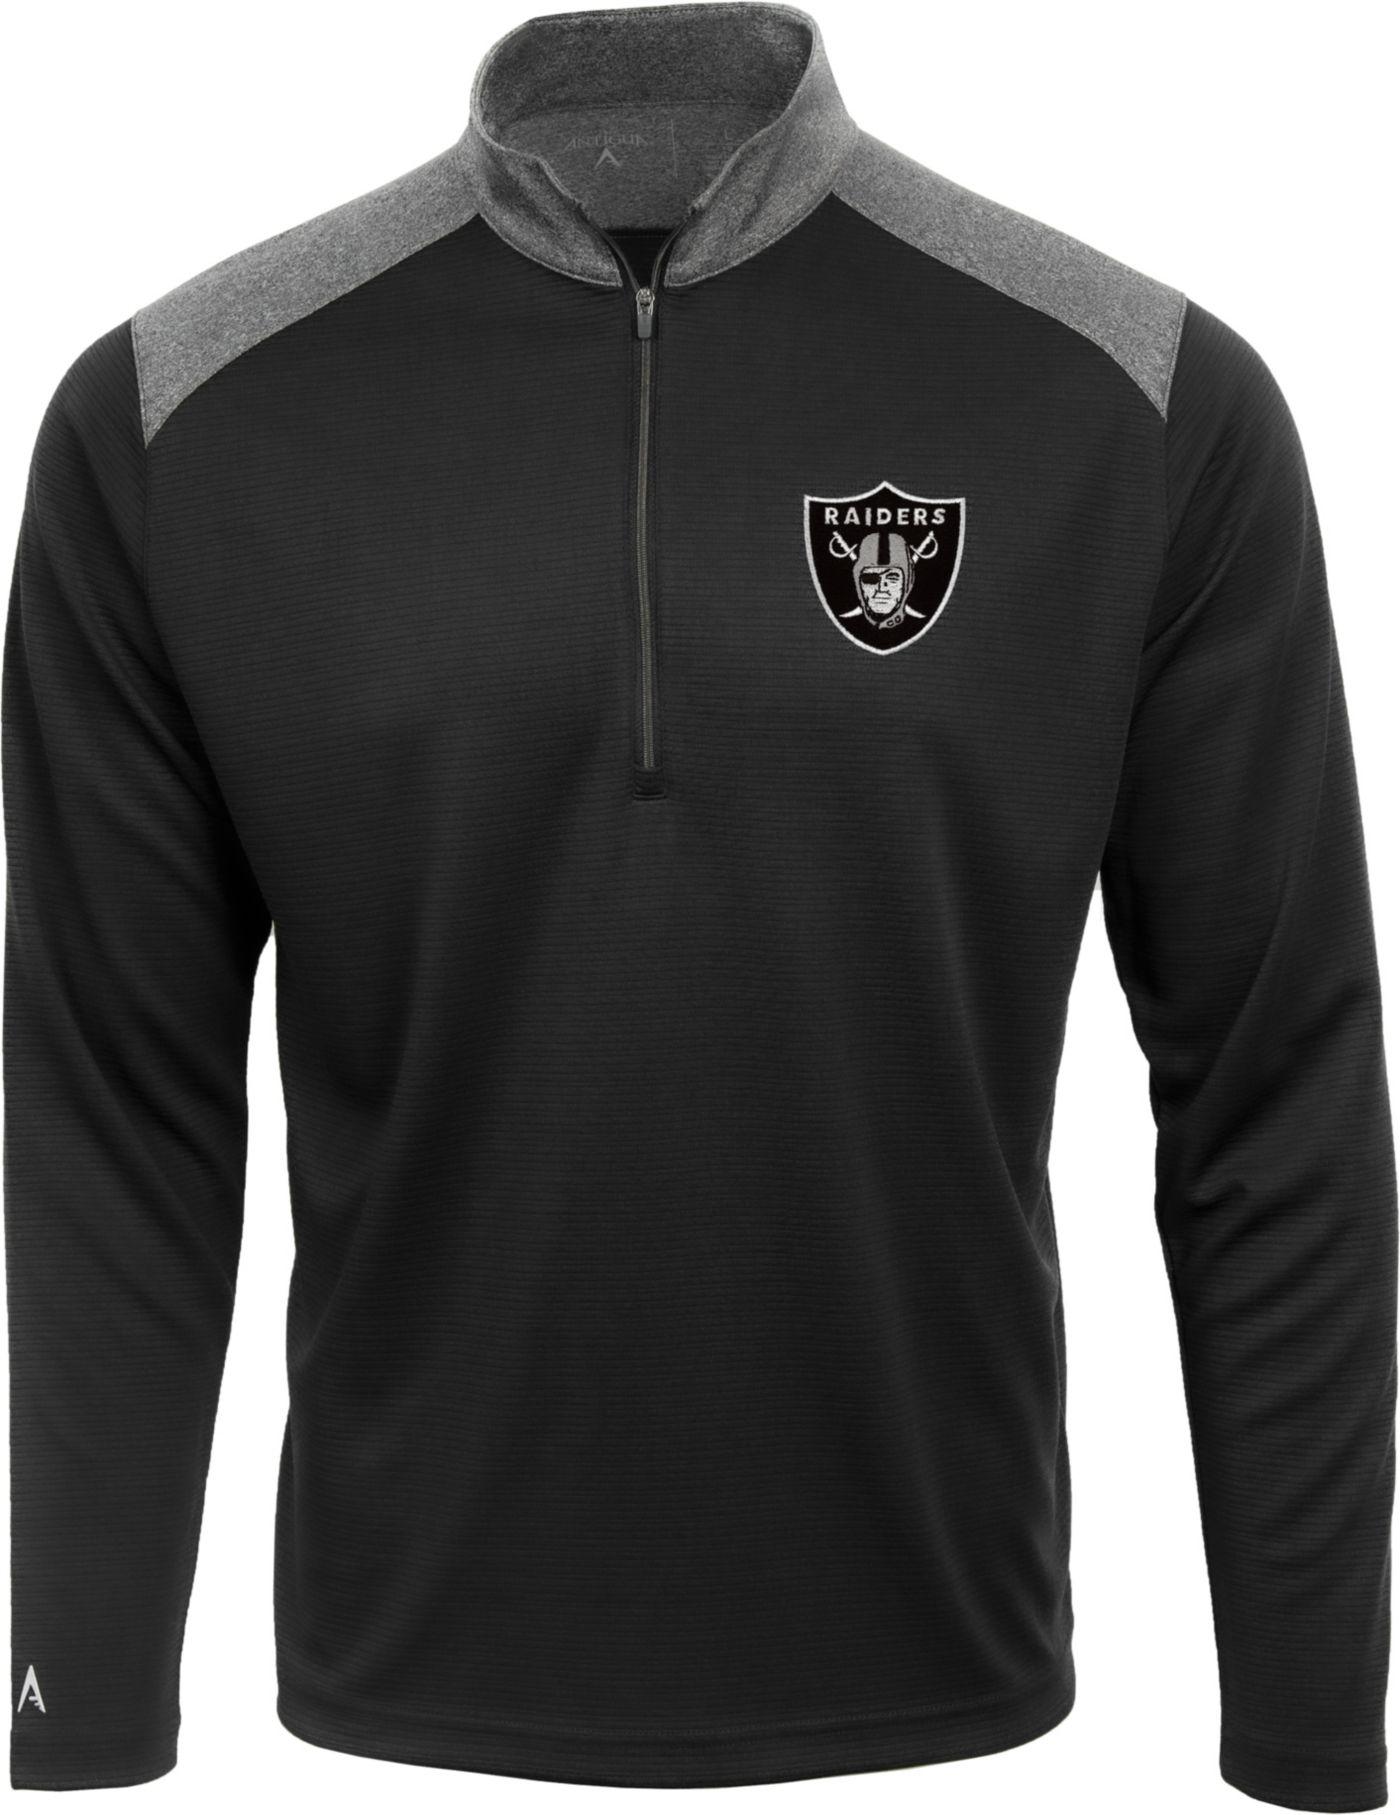 Antigua Men's Oakland Raiders Velocity Black Quarter-Zip Pullover